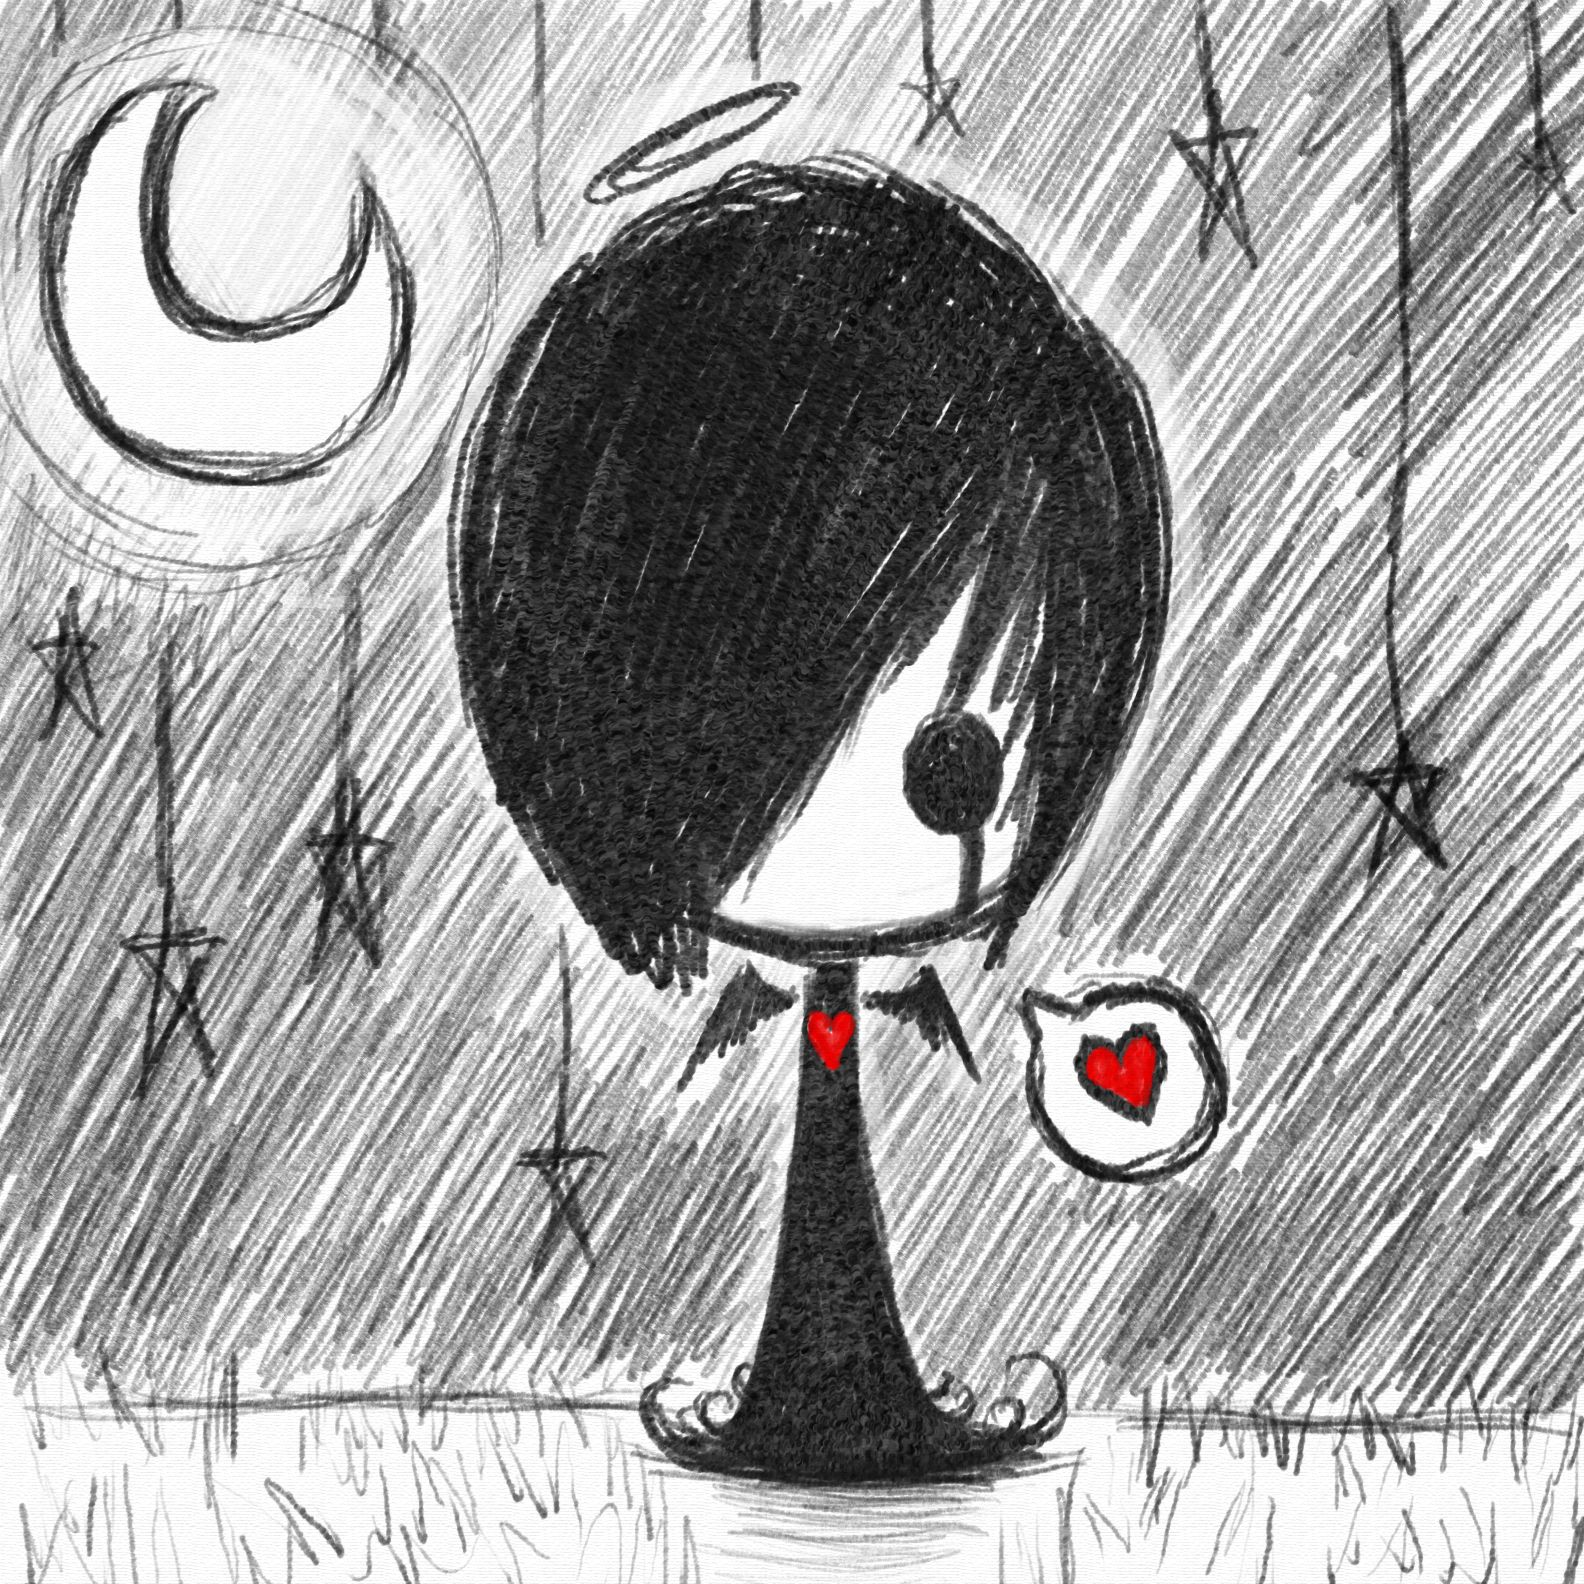 Cute Drawing Ideas: Search@MangoBite - Image - Cute Emo